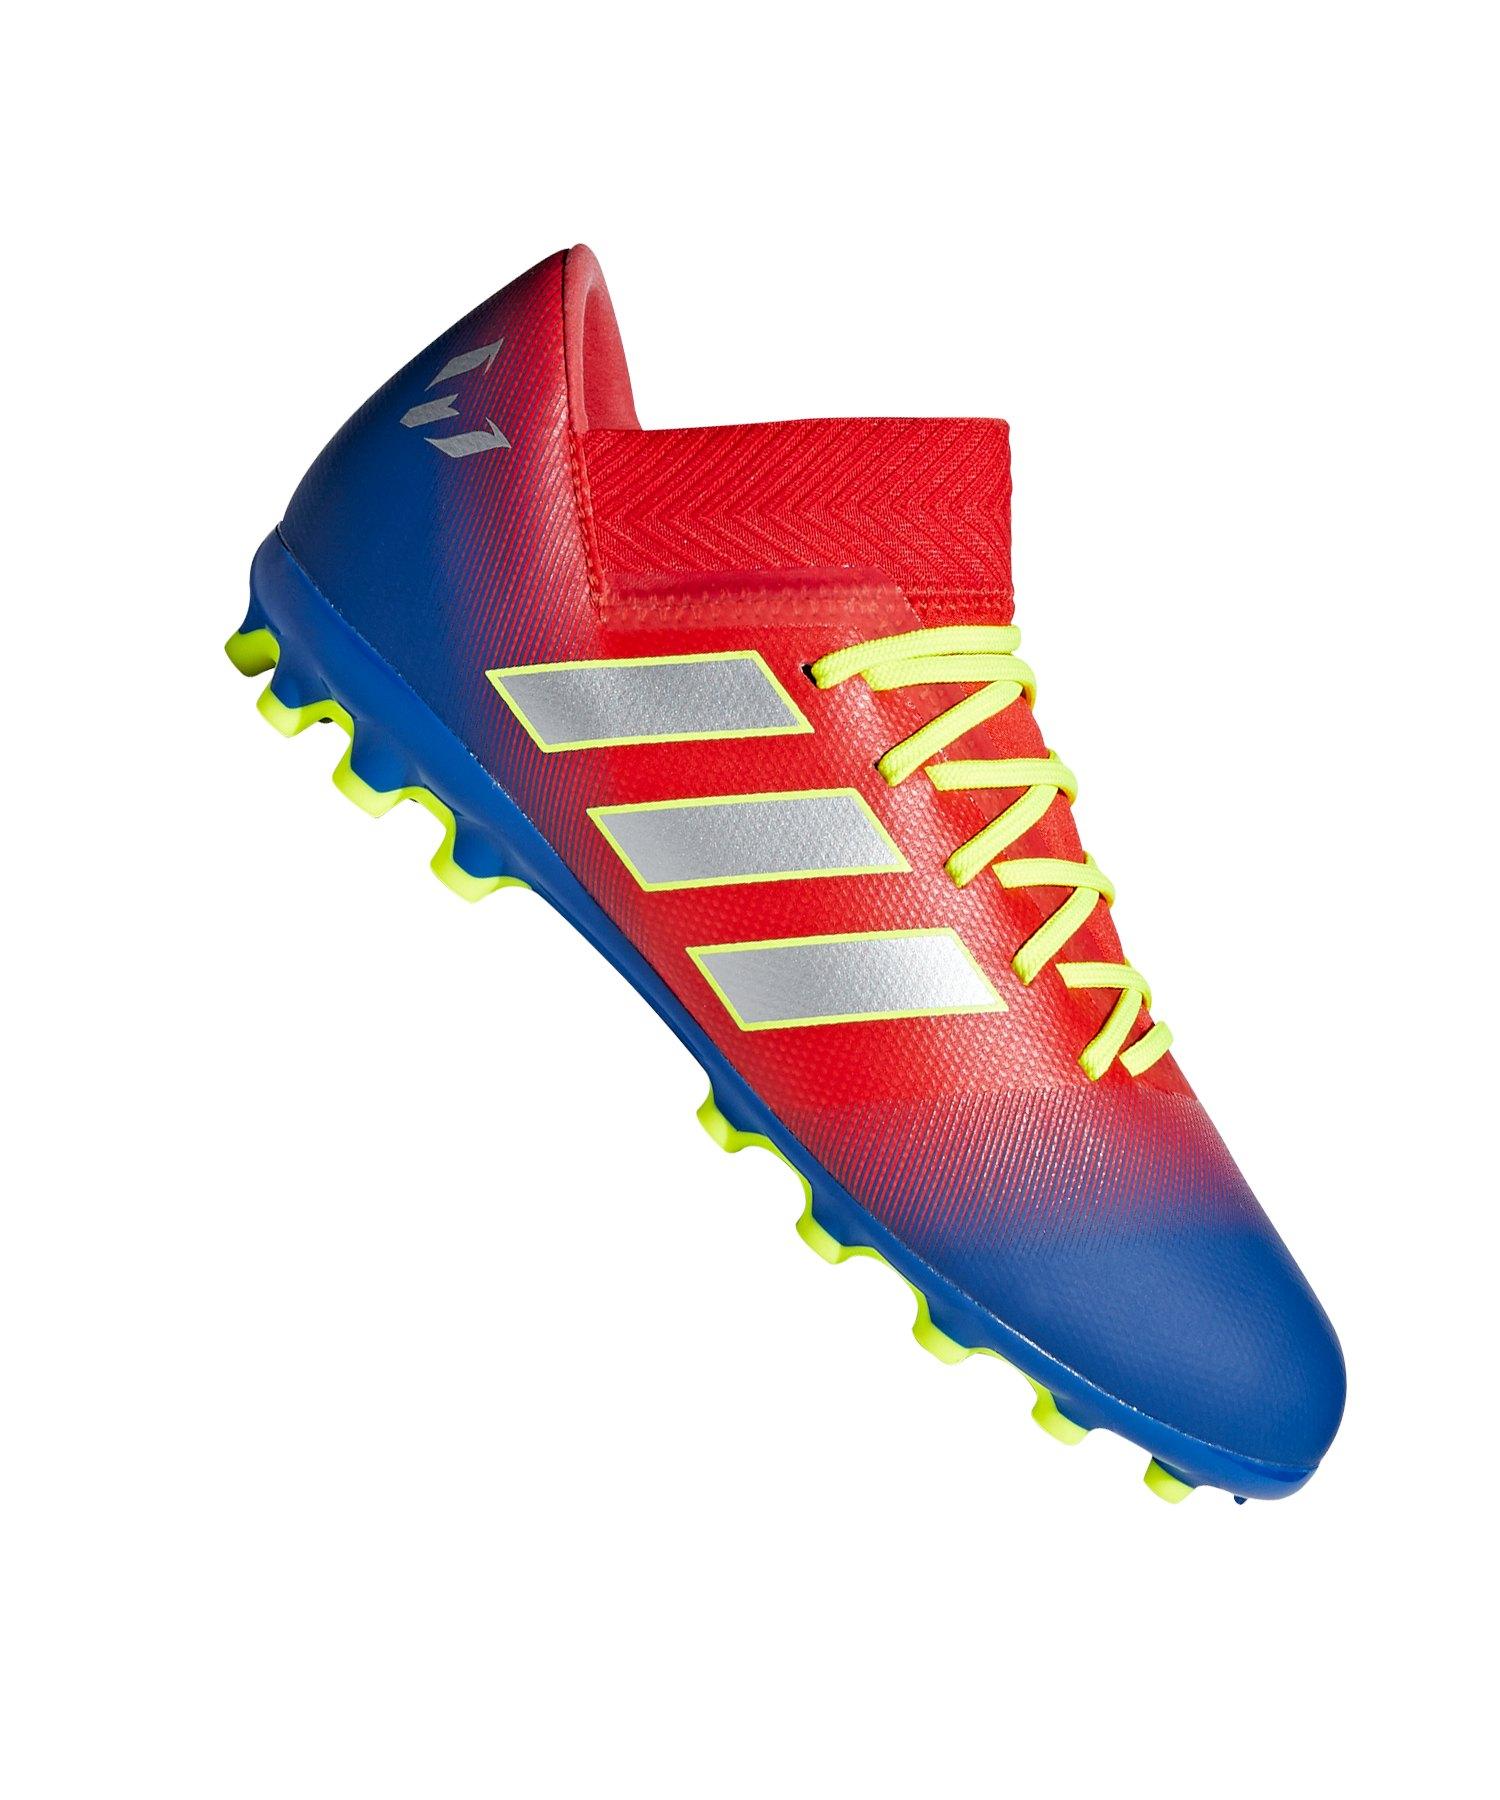 64d9de4749cd adidas NEMEZIZ Messi 18.3 AG J Kids Rot Blau - rot